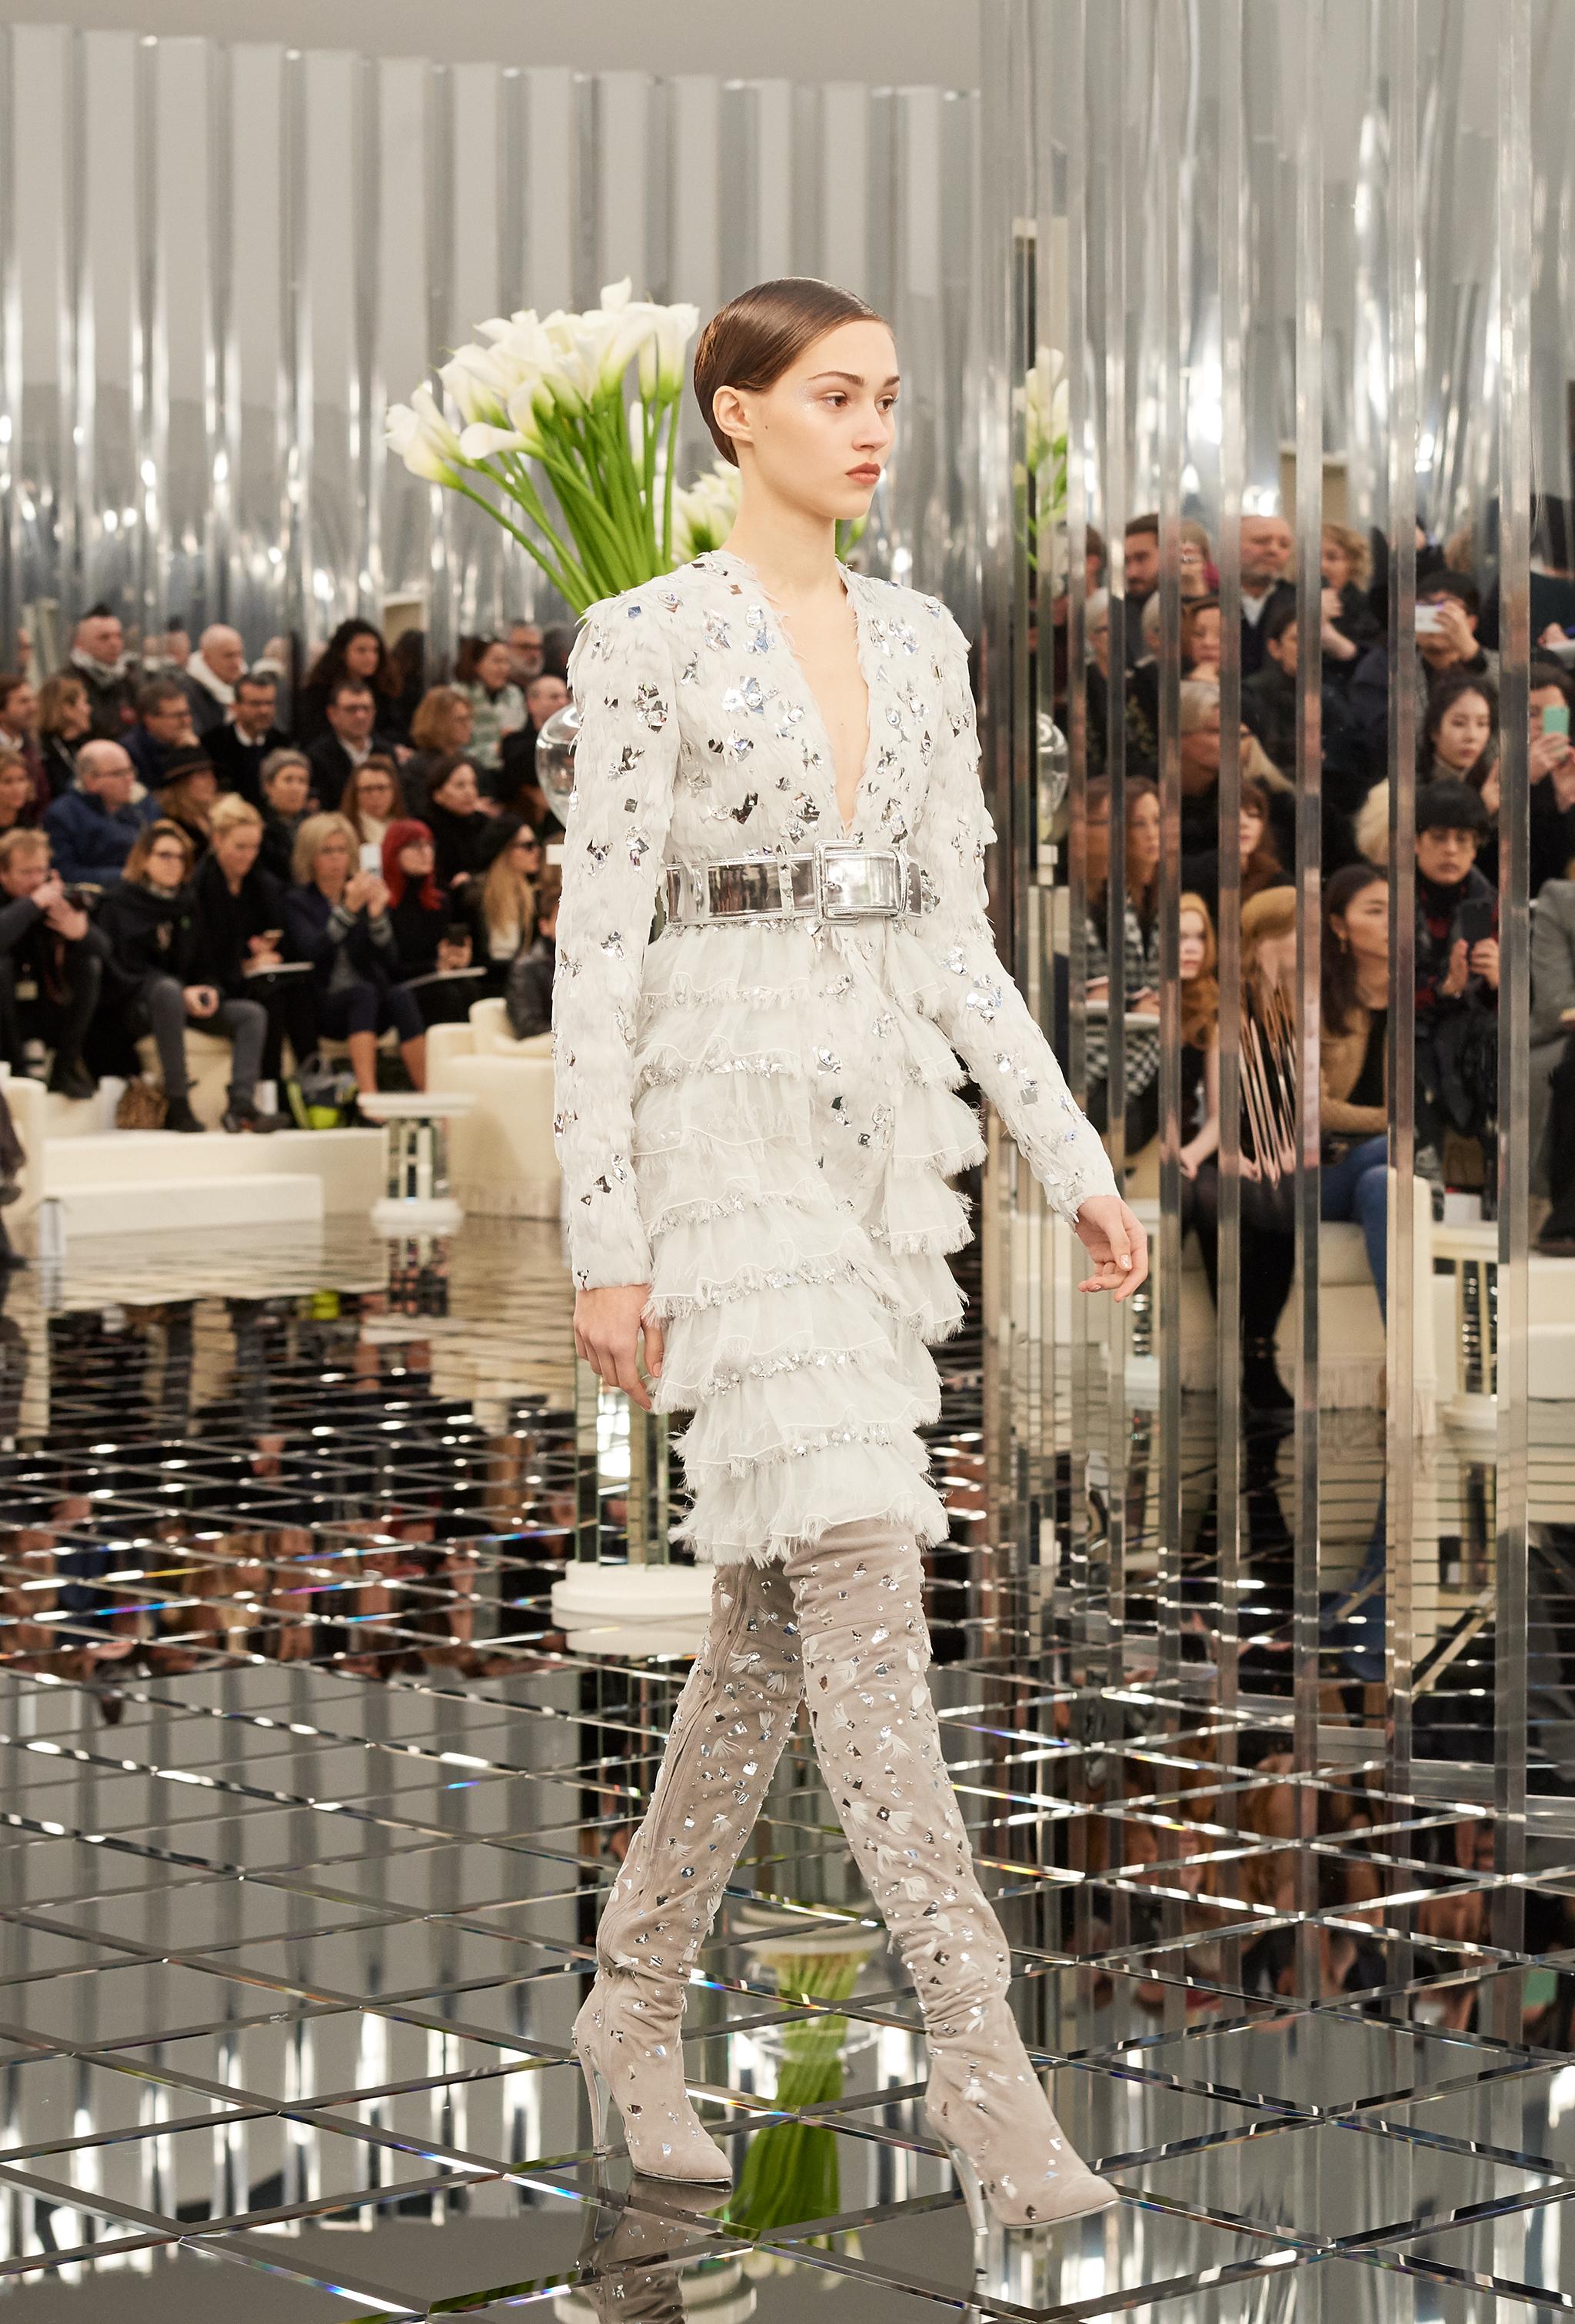 The Allure of Chanel Couture   Chopstix   the City e68b2269eb4